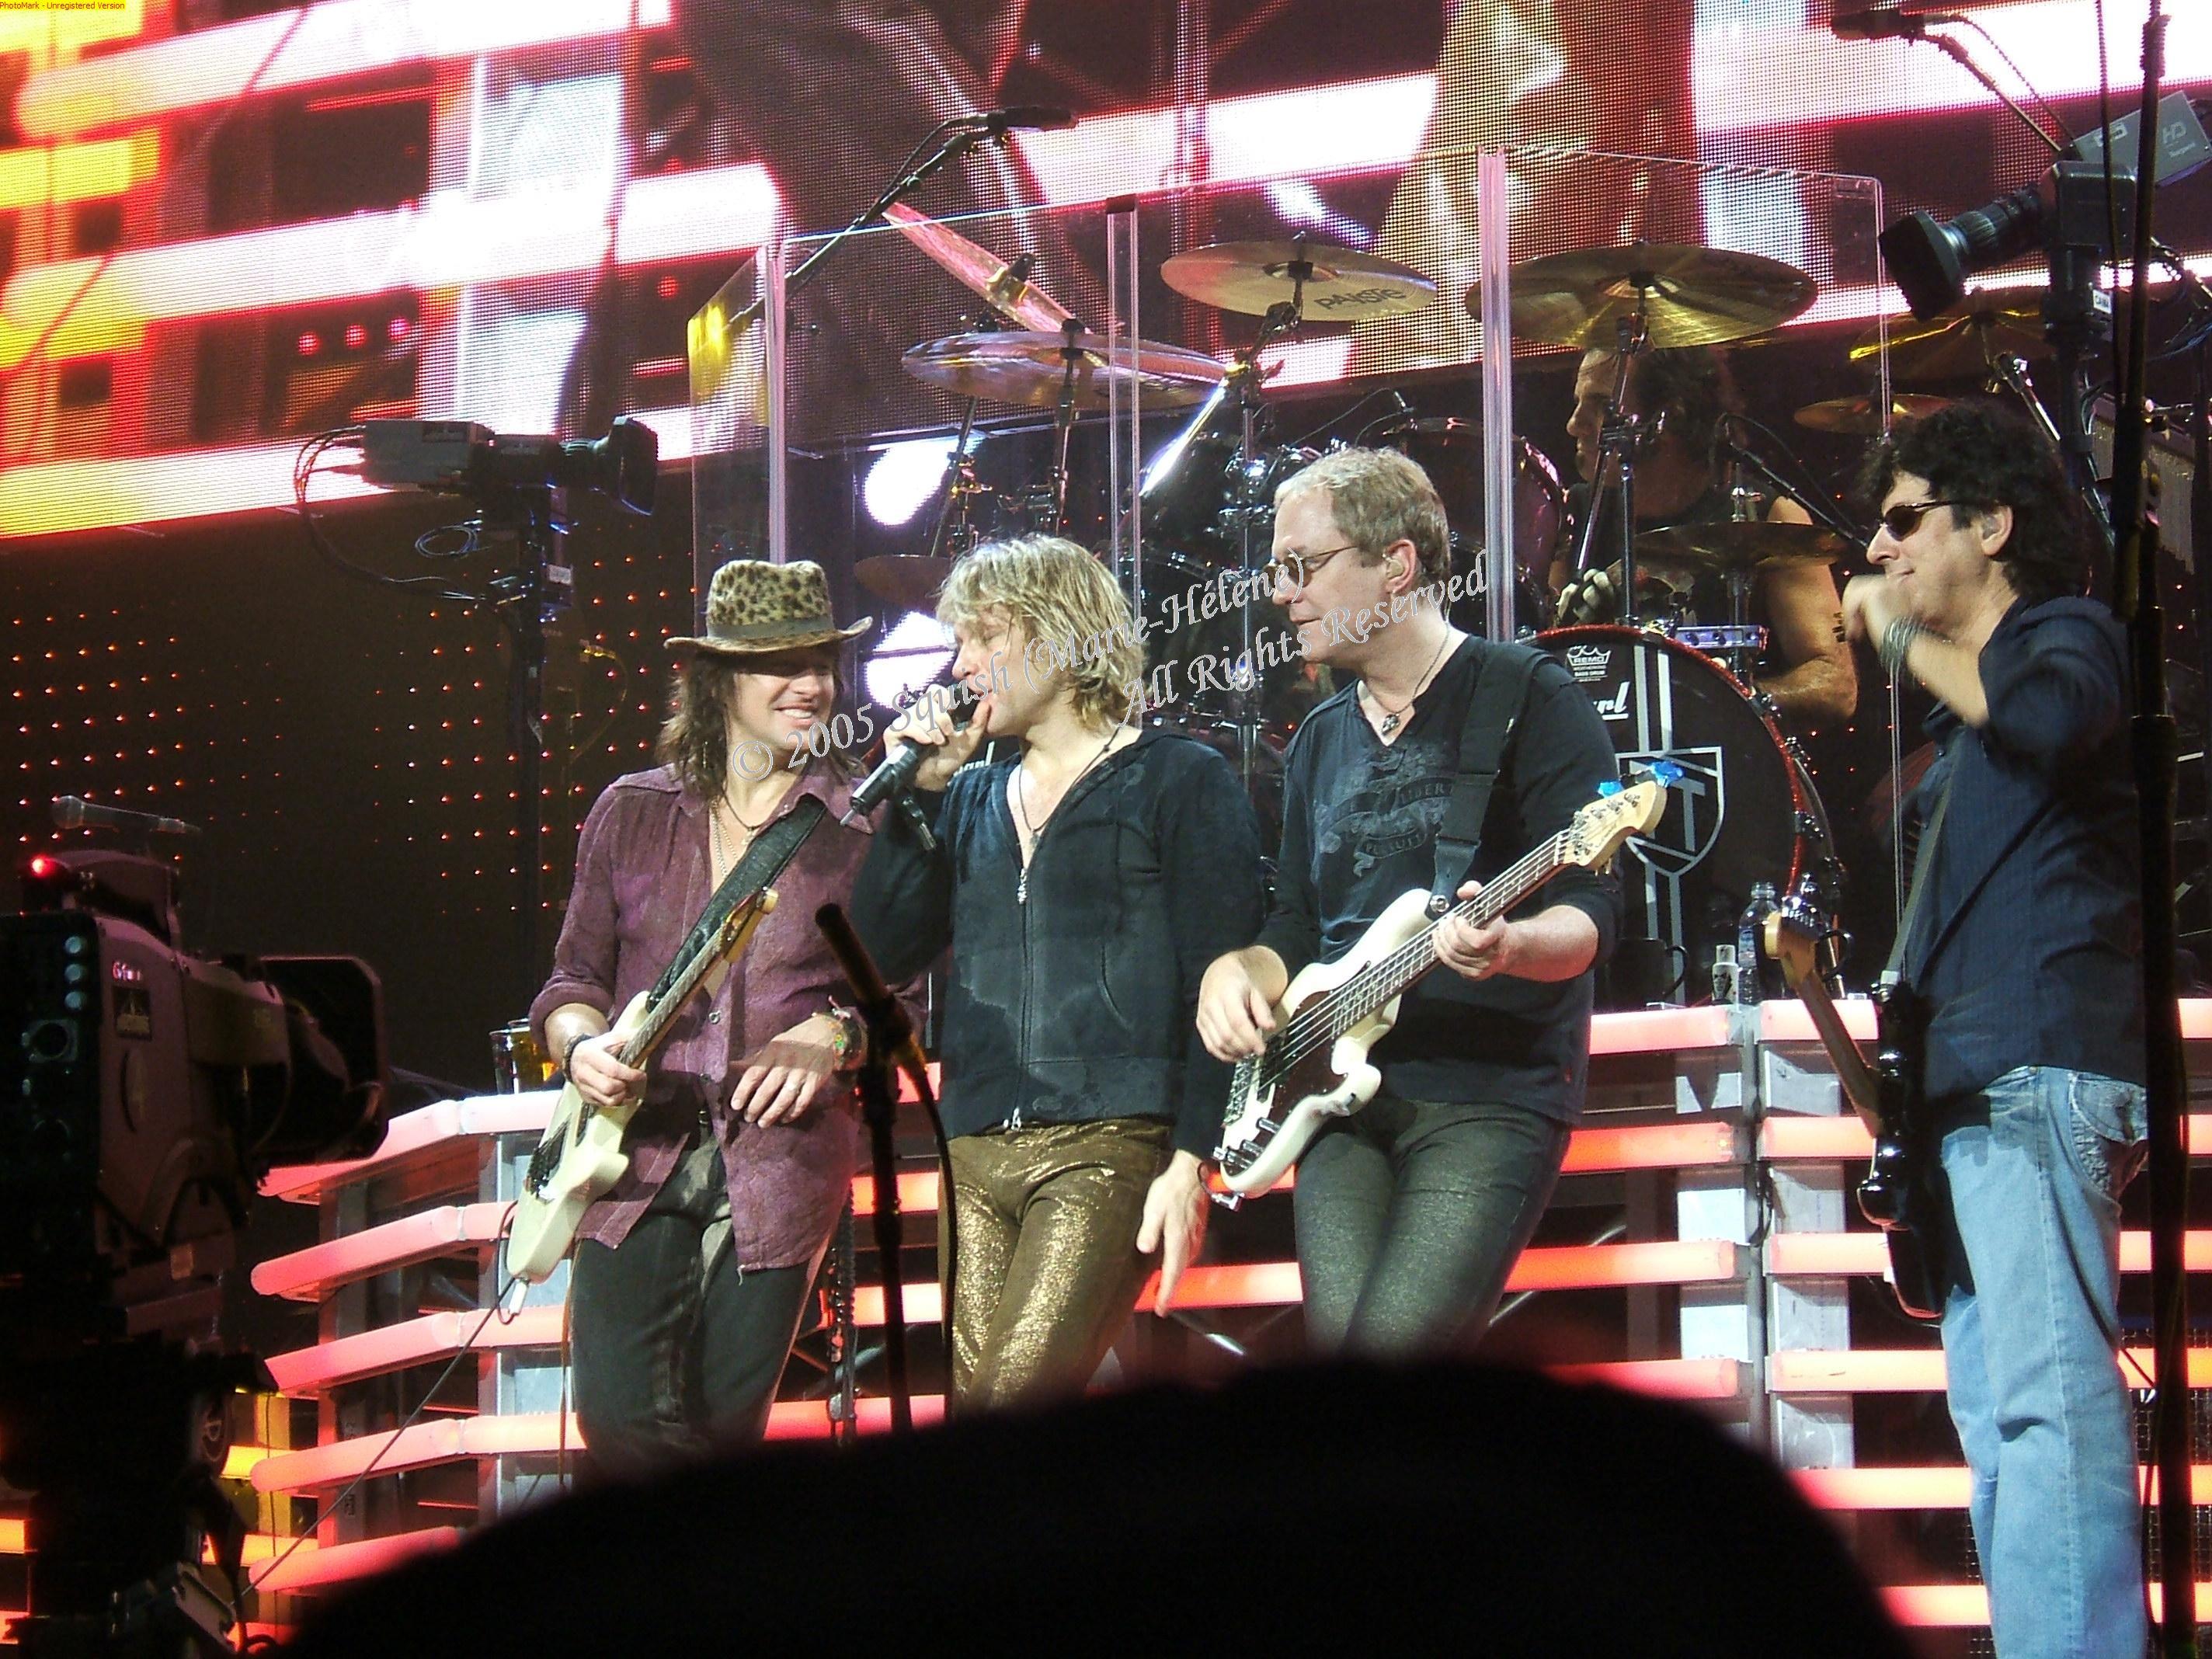 Bon Jovi - Centre Bell, Québec, Canada (15 décembre 2005)